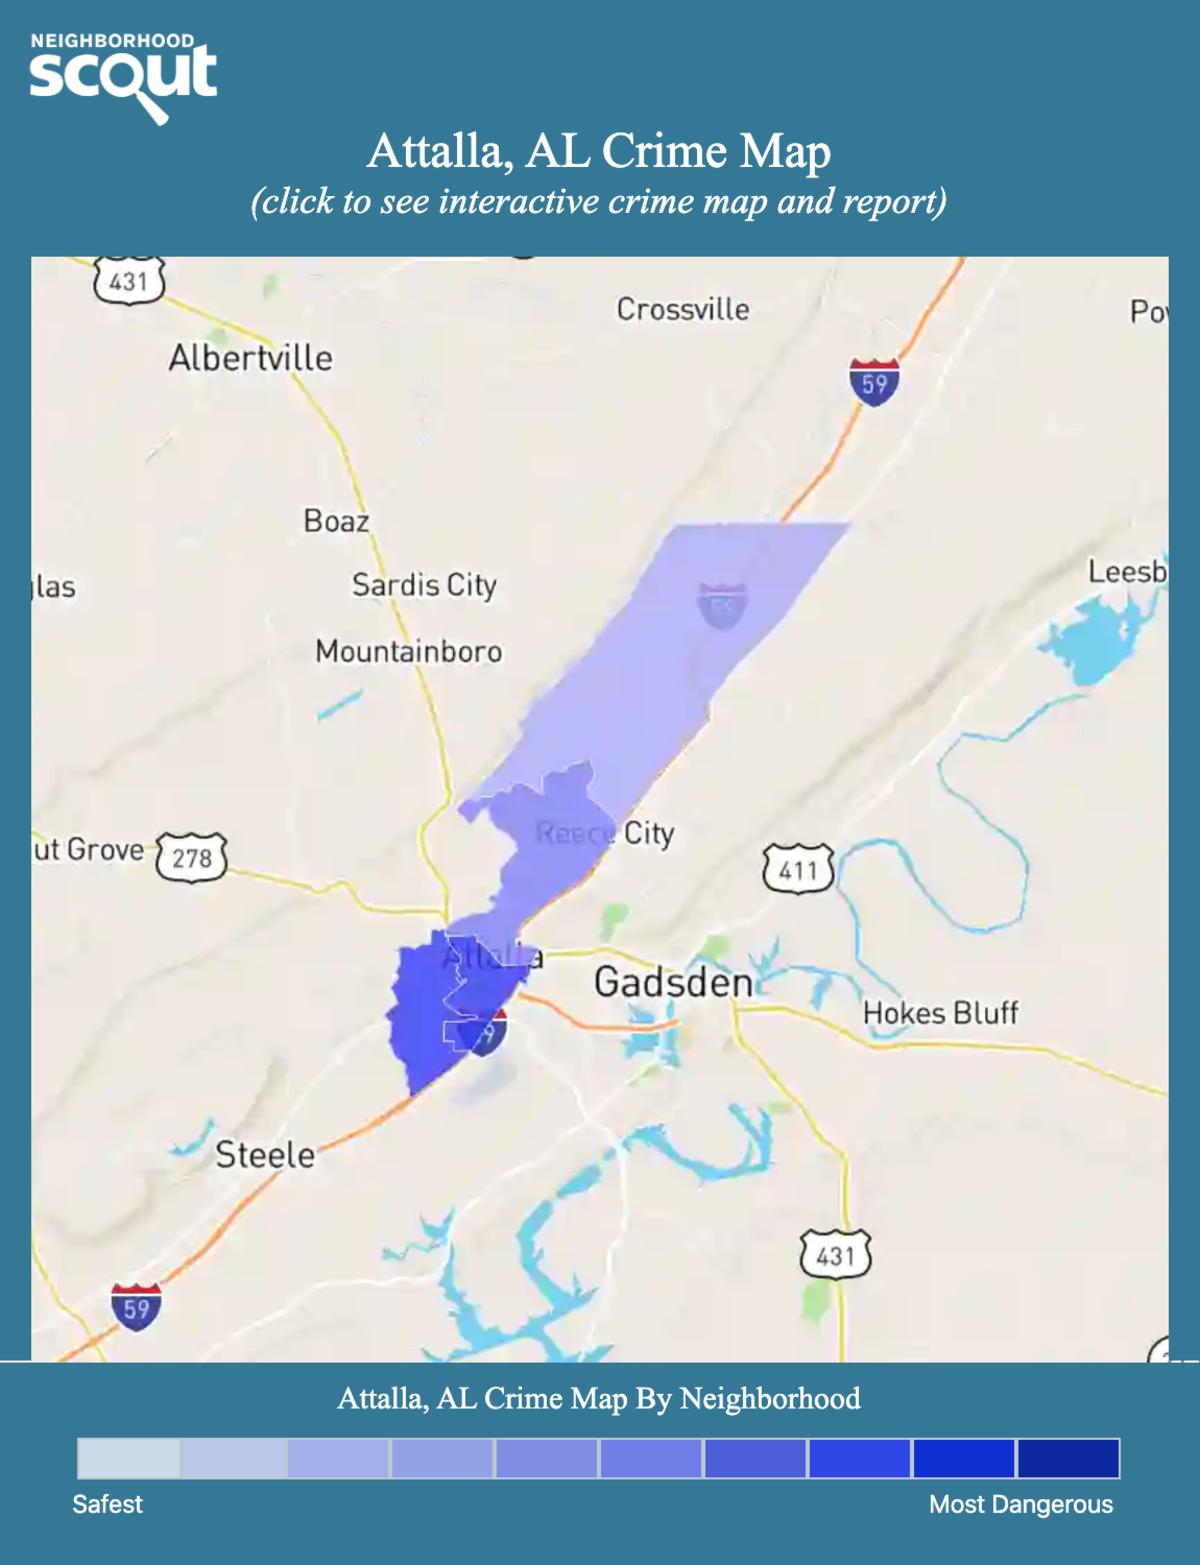 Attalla, Alabama crime map